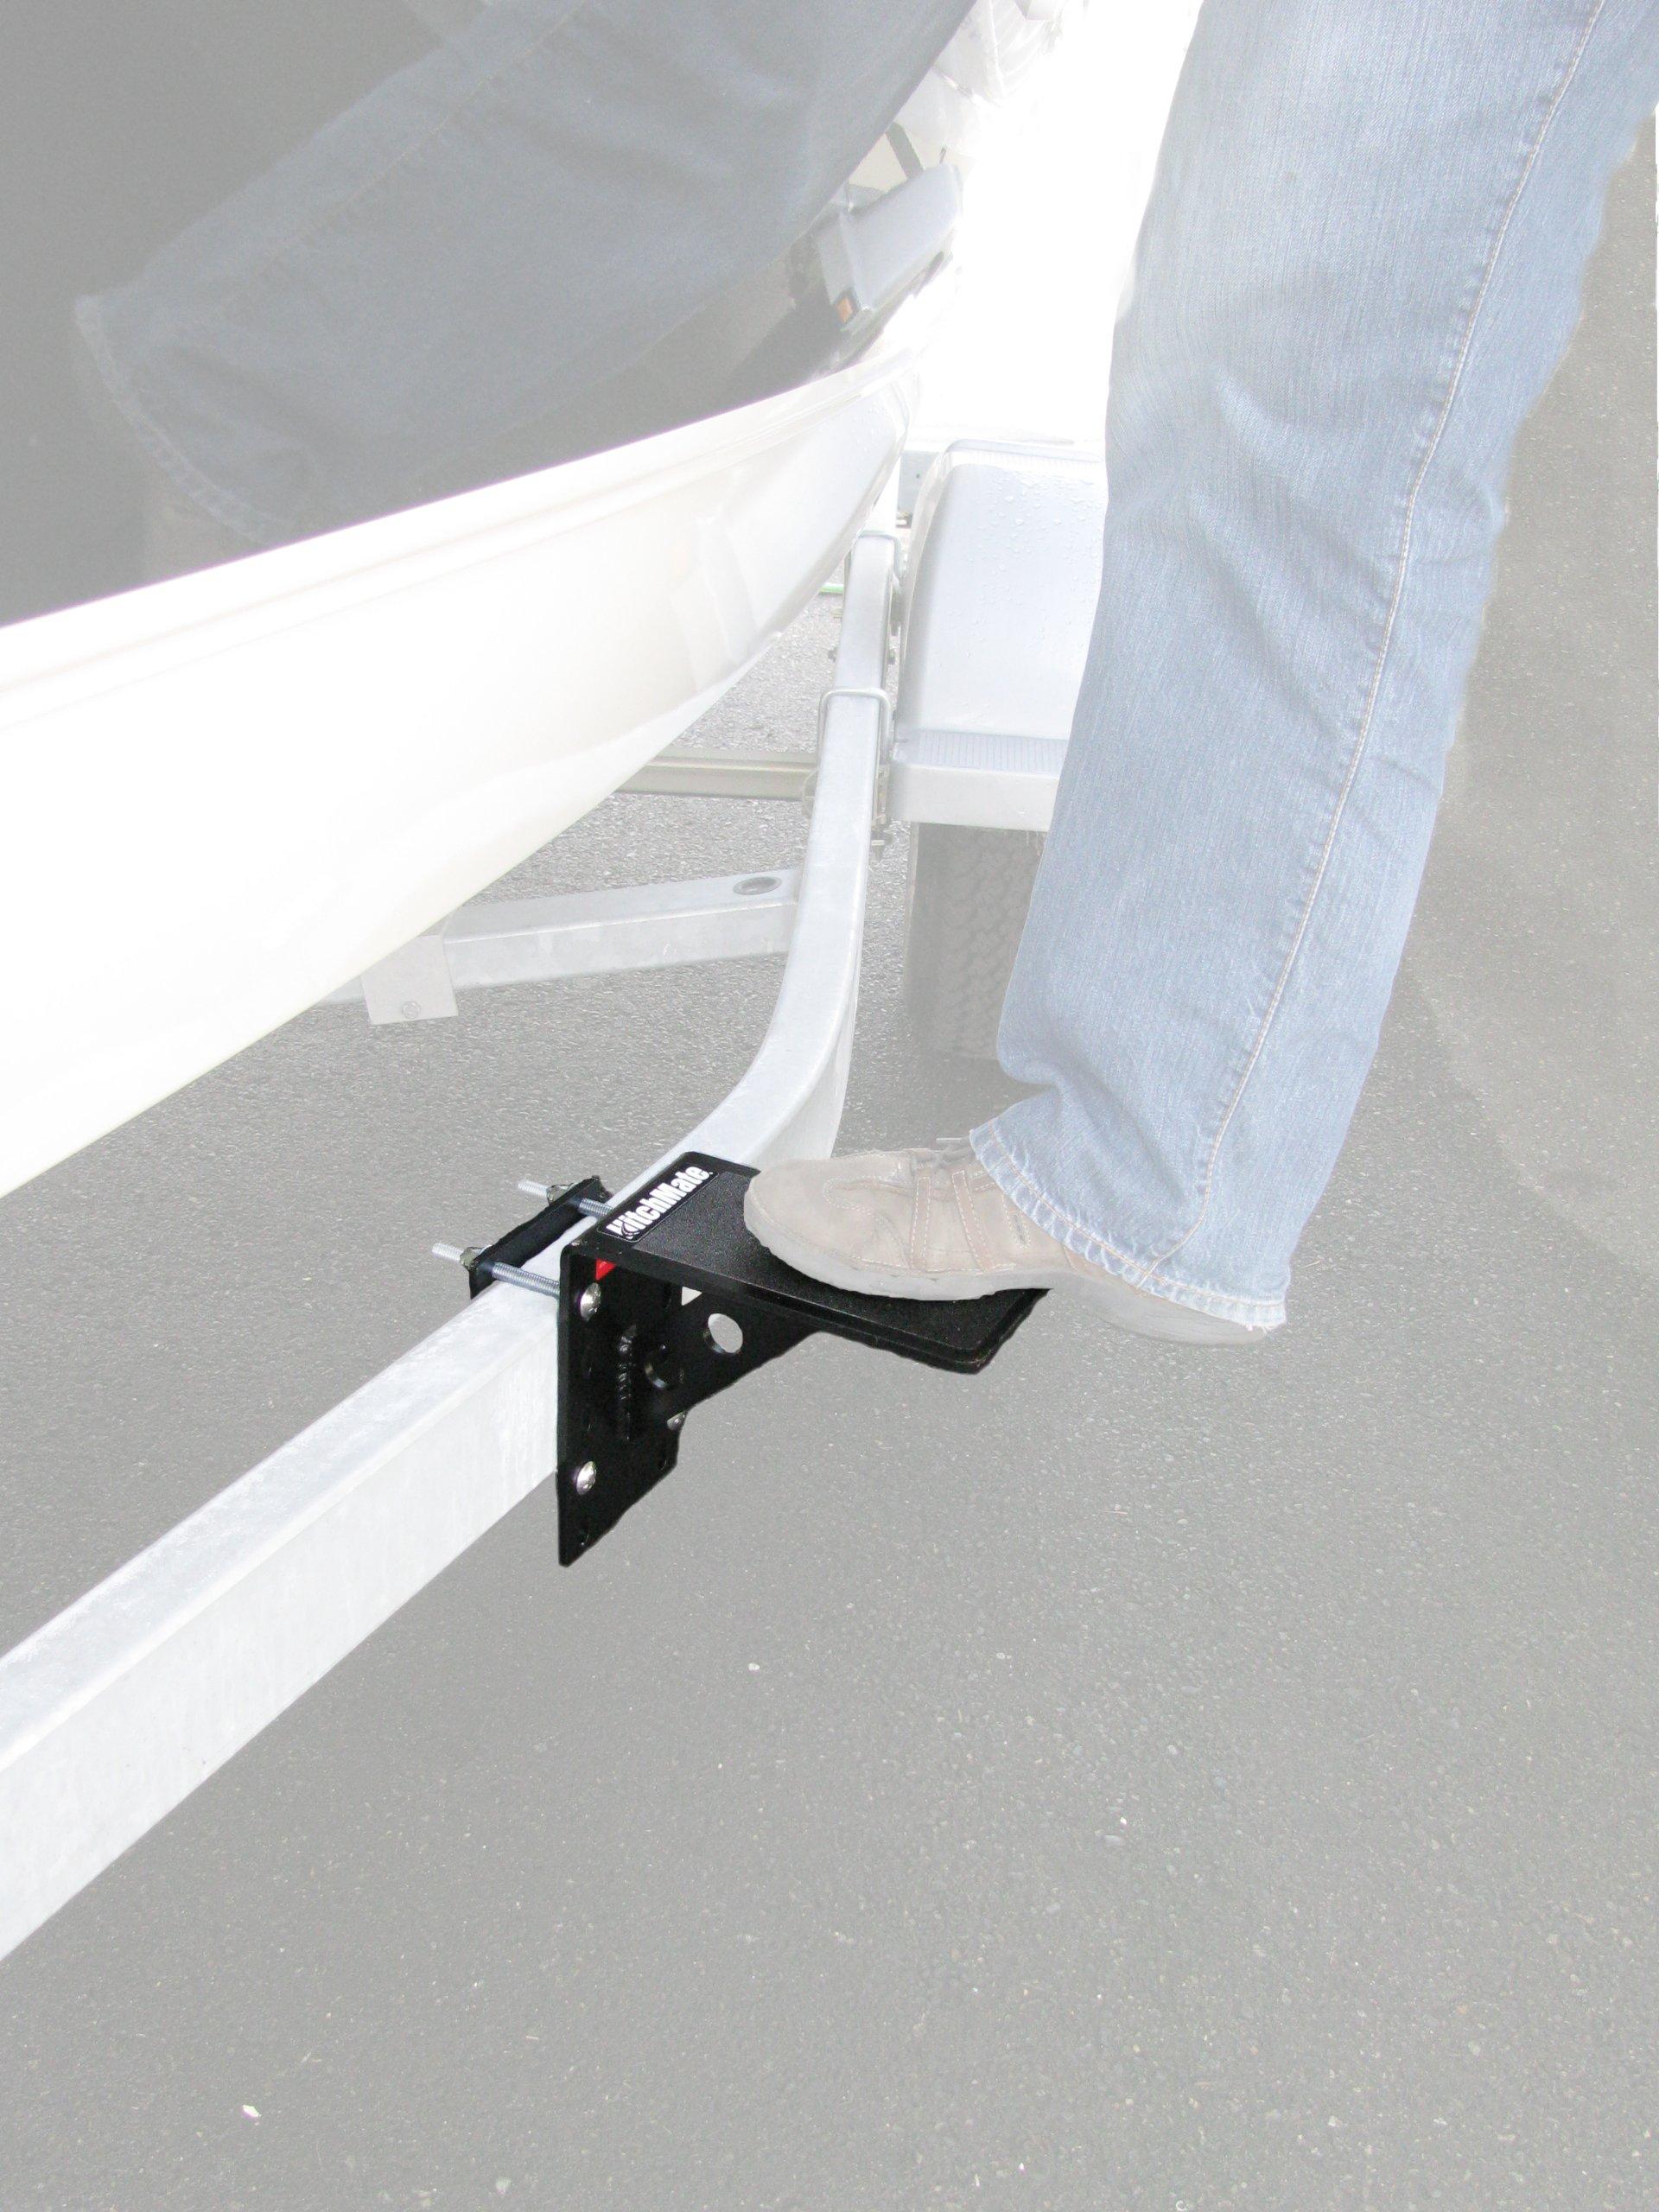 Heininger Hitchmate Black 4036 5-Inch Trailer Step